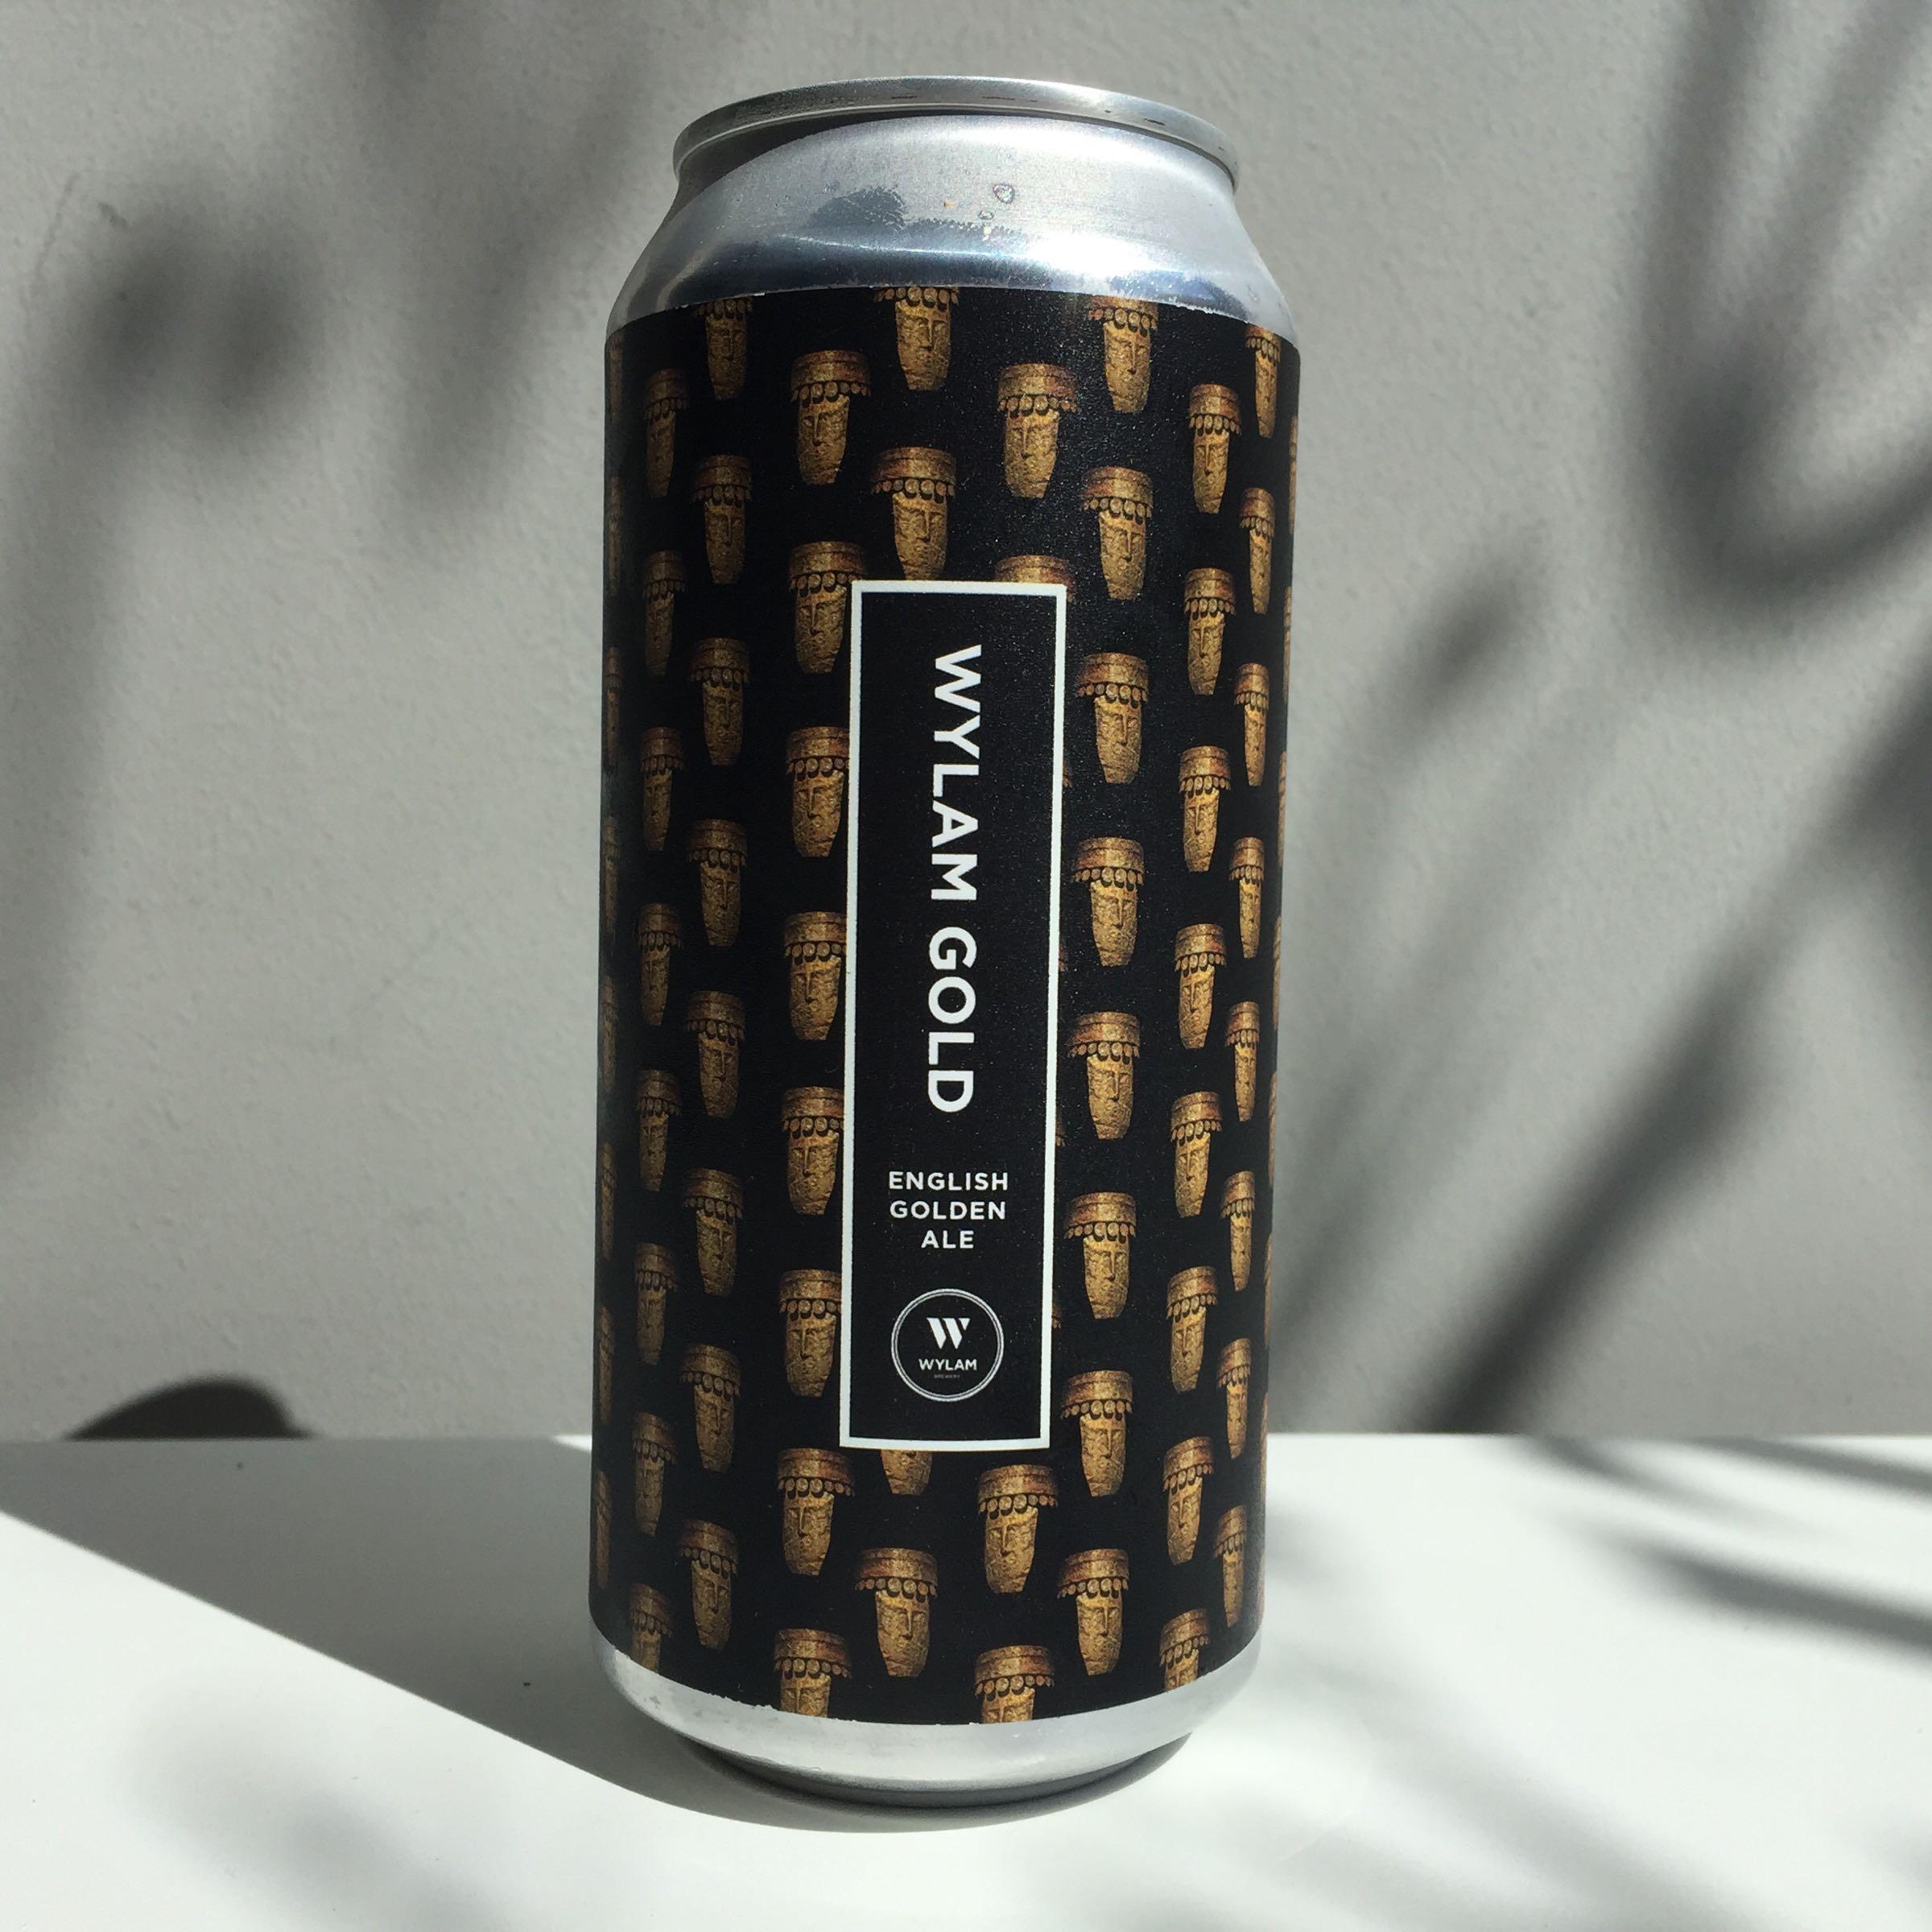 Wylam Gold 'English Golden Ale' 440ml 4.0%